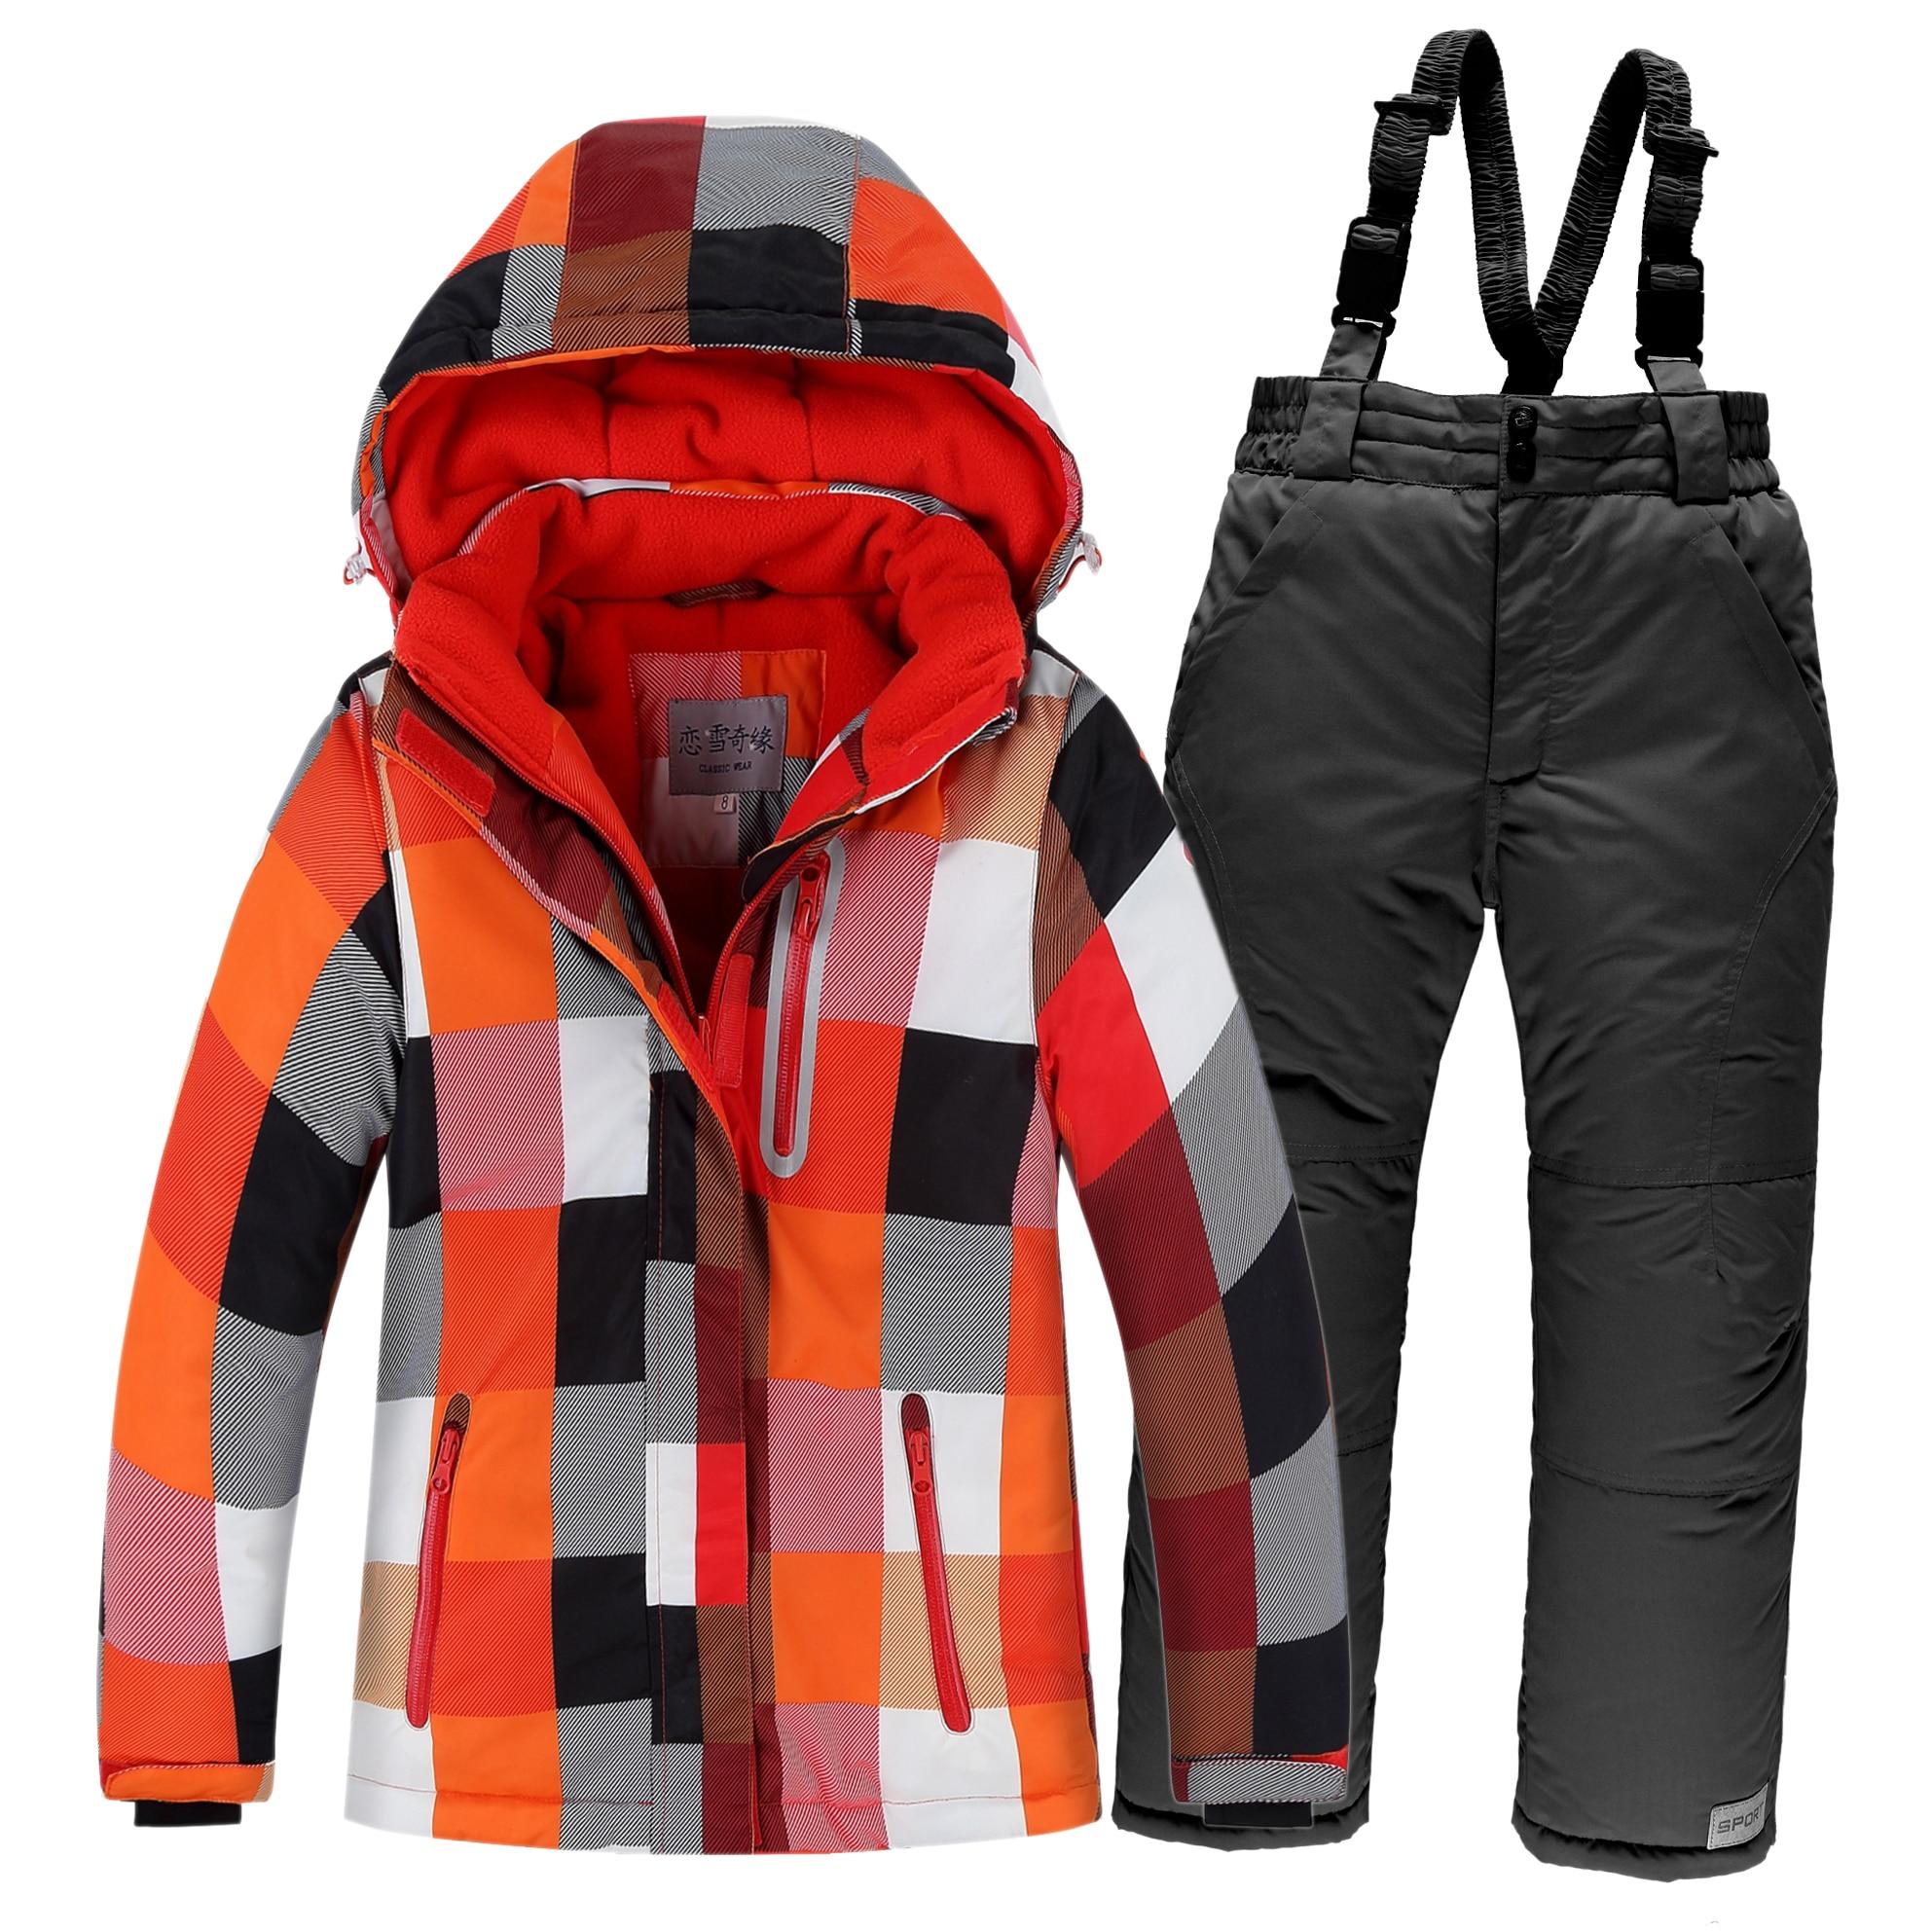 OLEKID Winter Children Ski Suit Windproof Warm Girls Clothing Set Jacket Overalls Boys Clothes Set 3